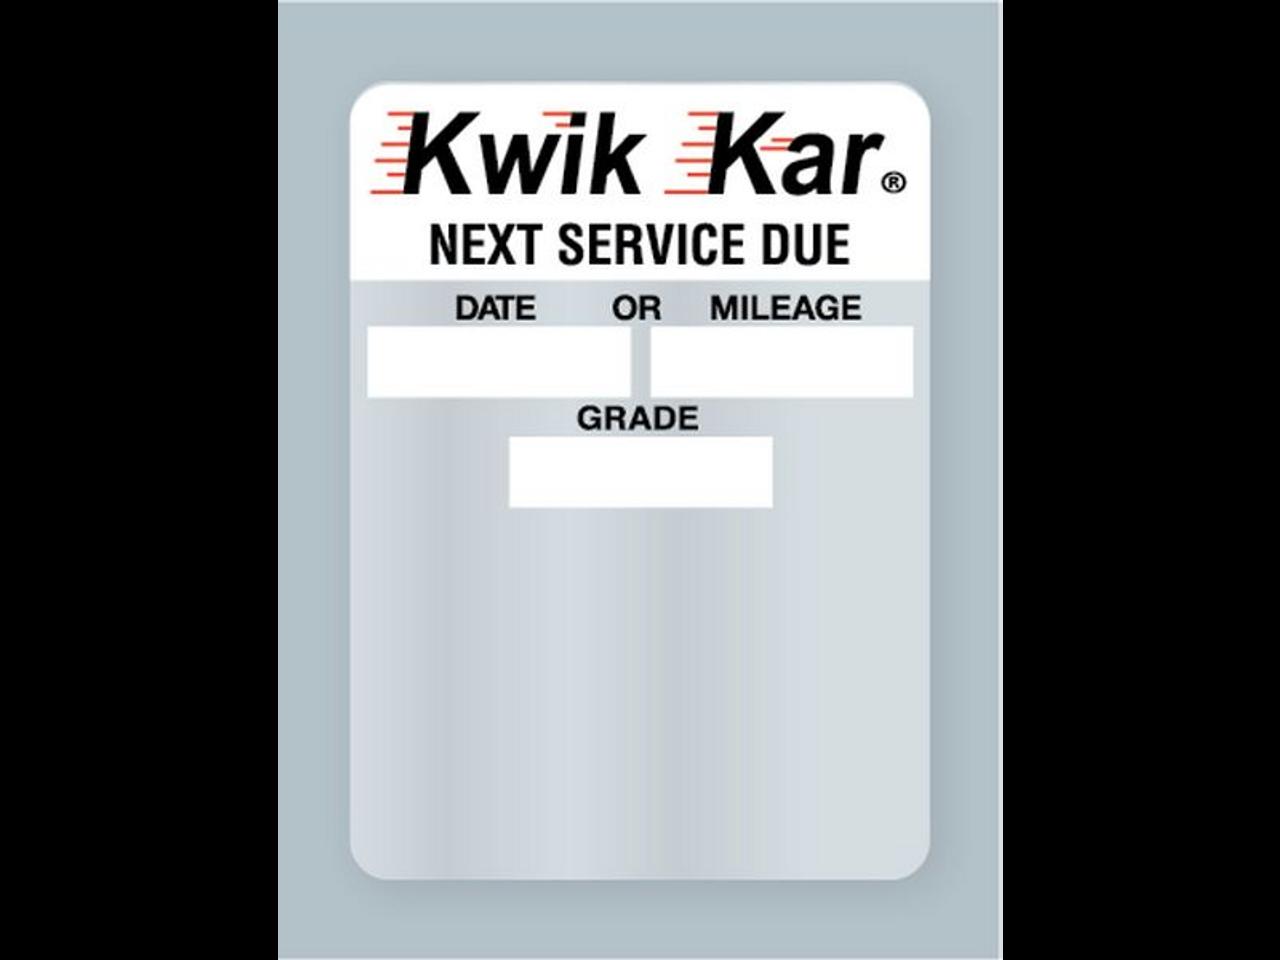 Kwik Kar Oil Change Sticker - Next Service Due Static Cling